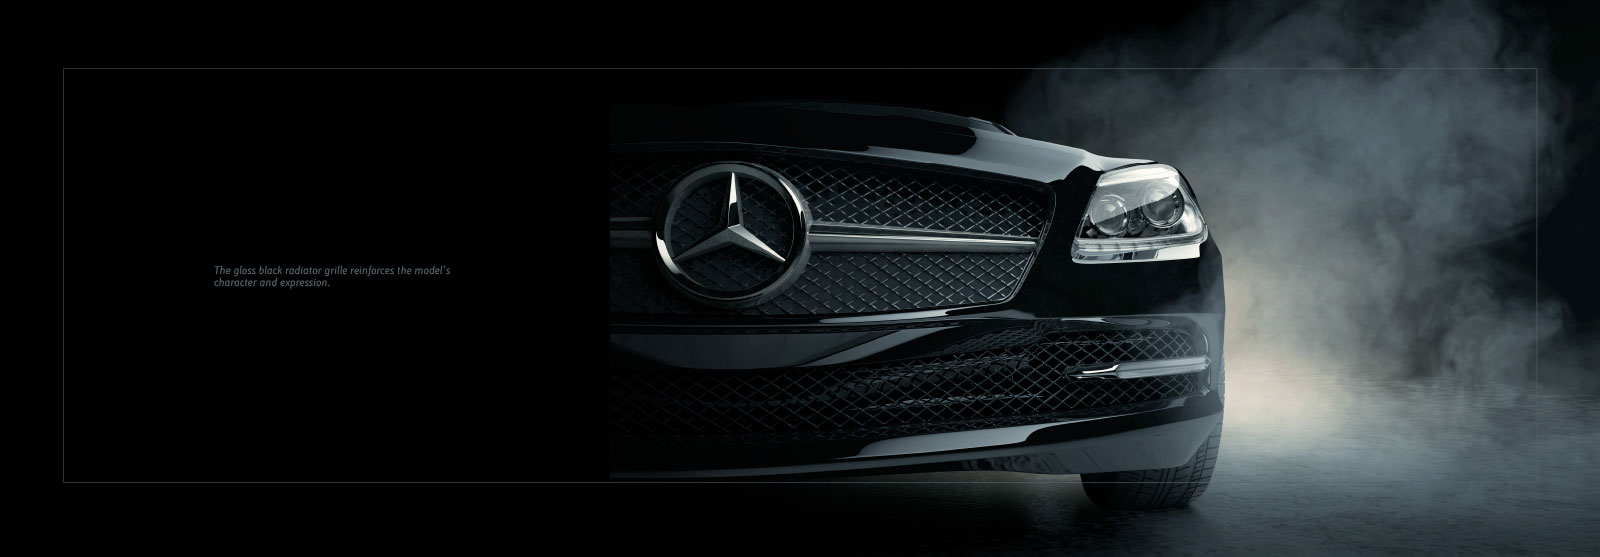 Editorial-Mercedes-Dream-final-6